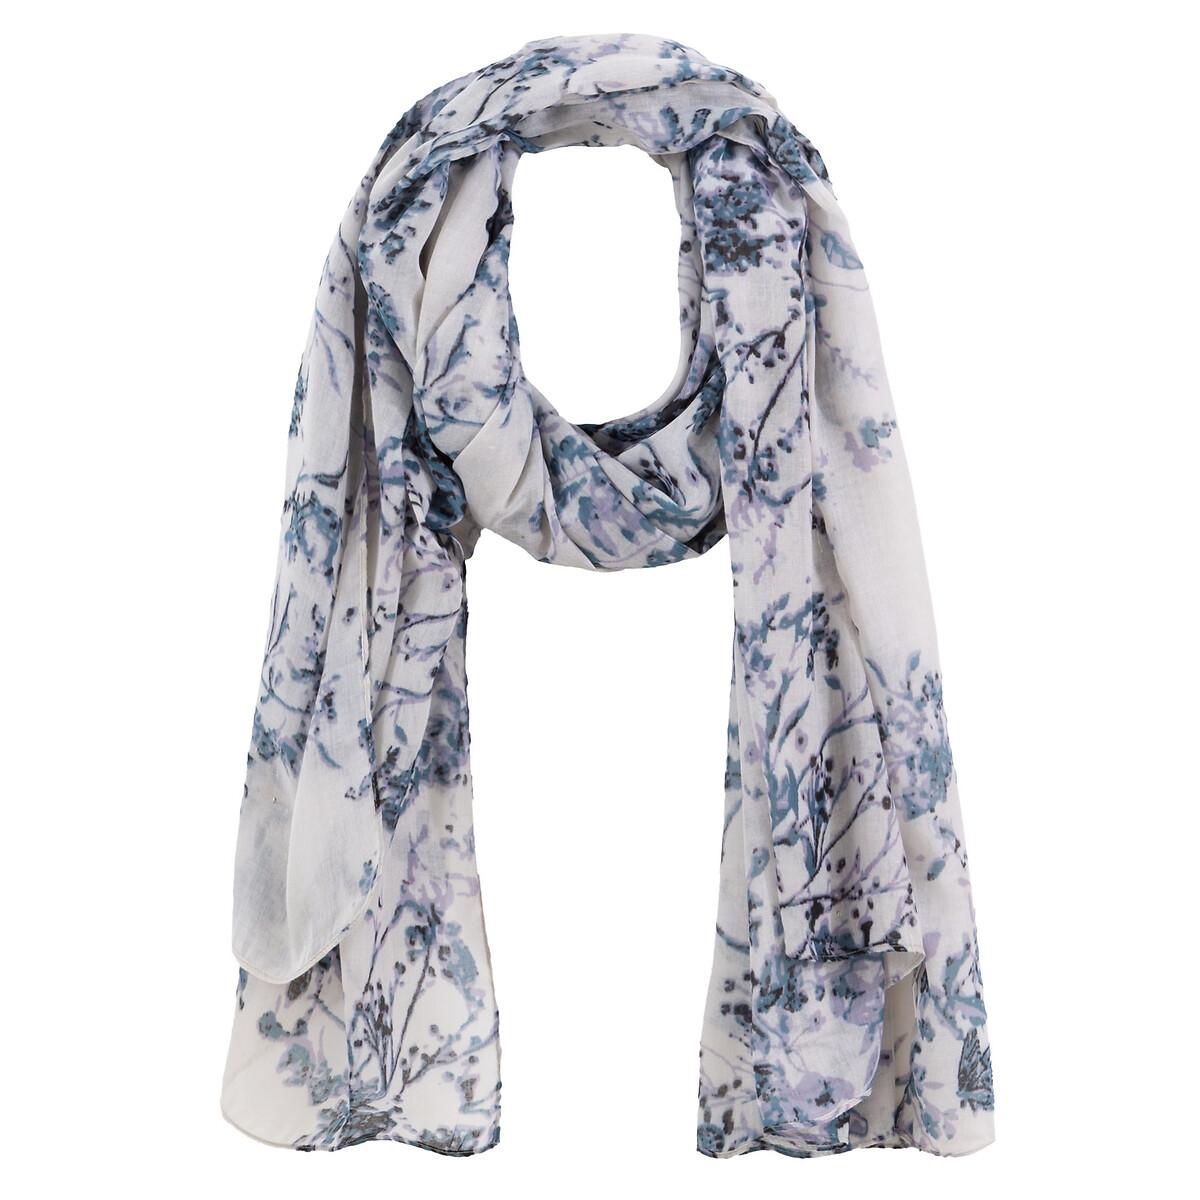 Платок La Redoute С цветочным рисунком UNI синий платок с рисунком